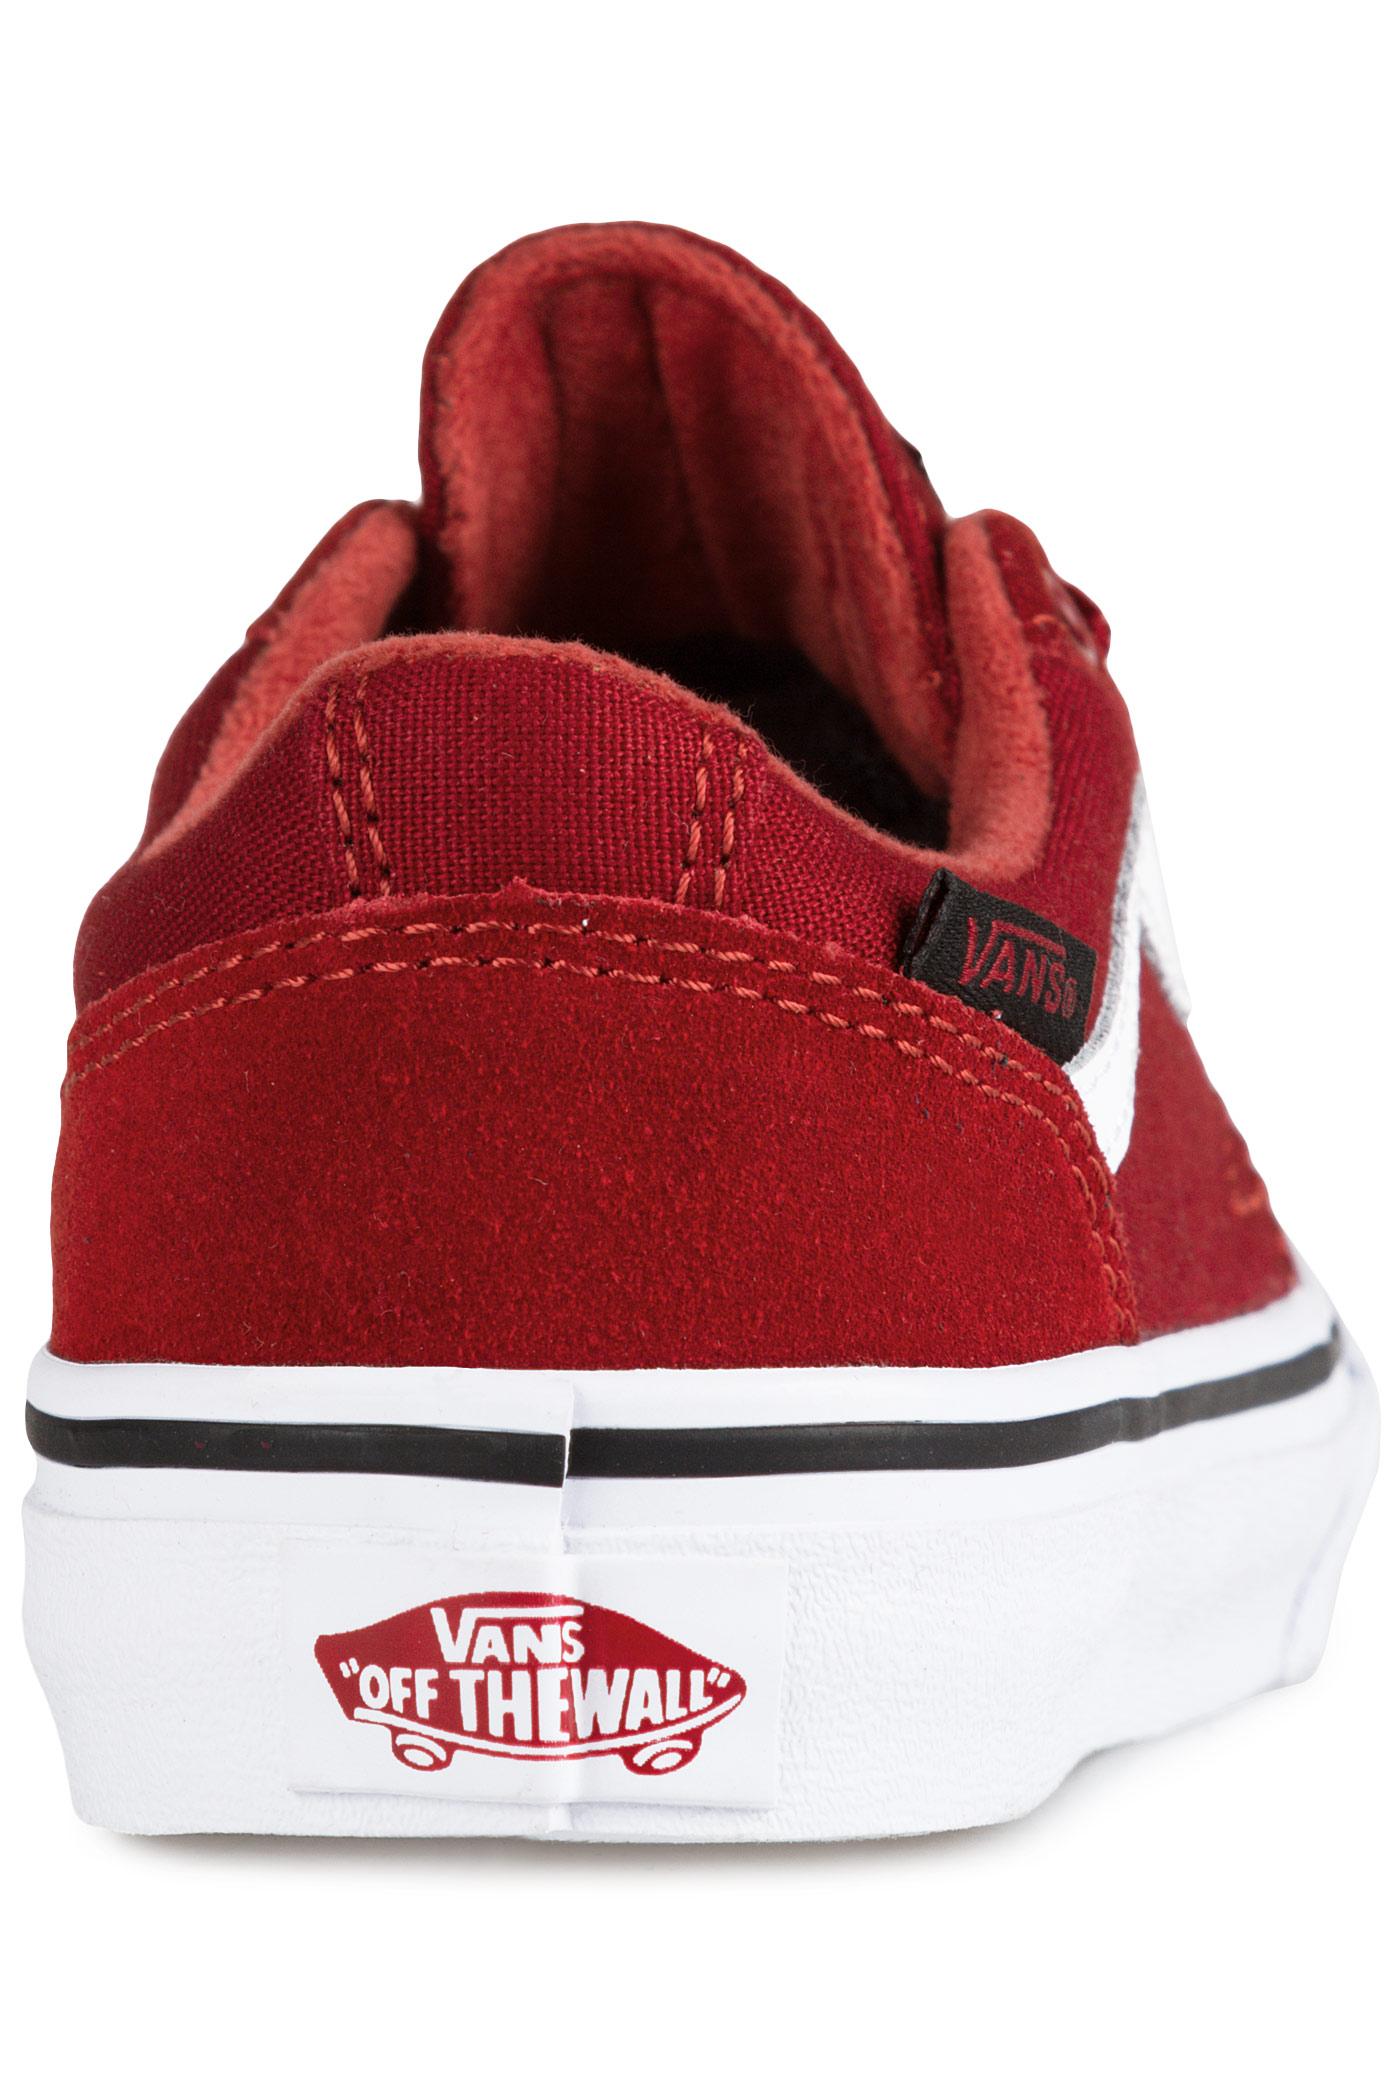 54d52f53204 Vans chapman stripe shoe kids varsity red buy at skatedeluxe jpg 1400x2100 Skatedeluxe  chapman stripe silhouette